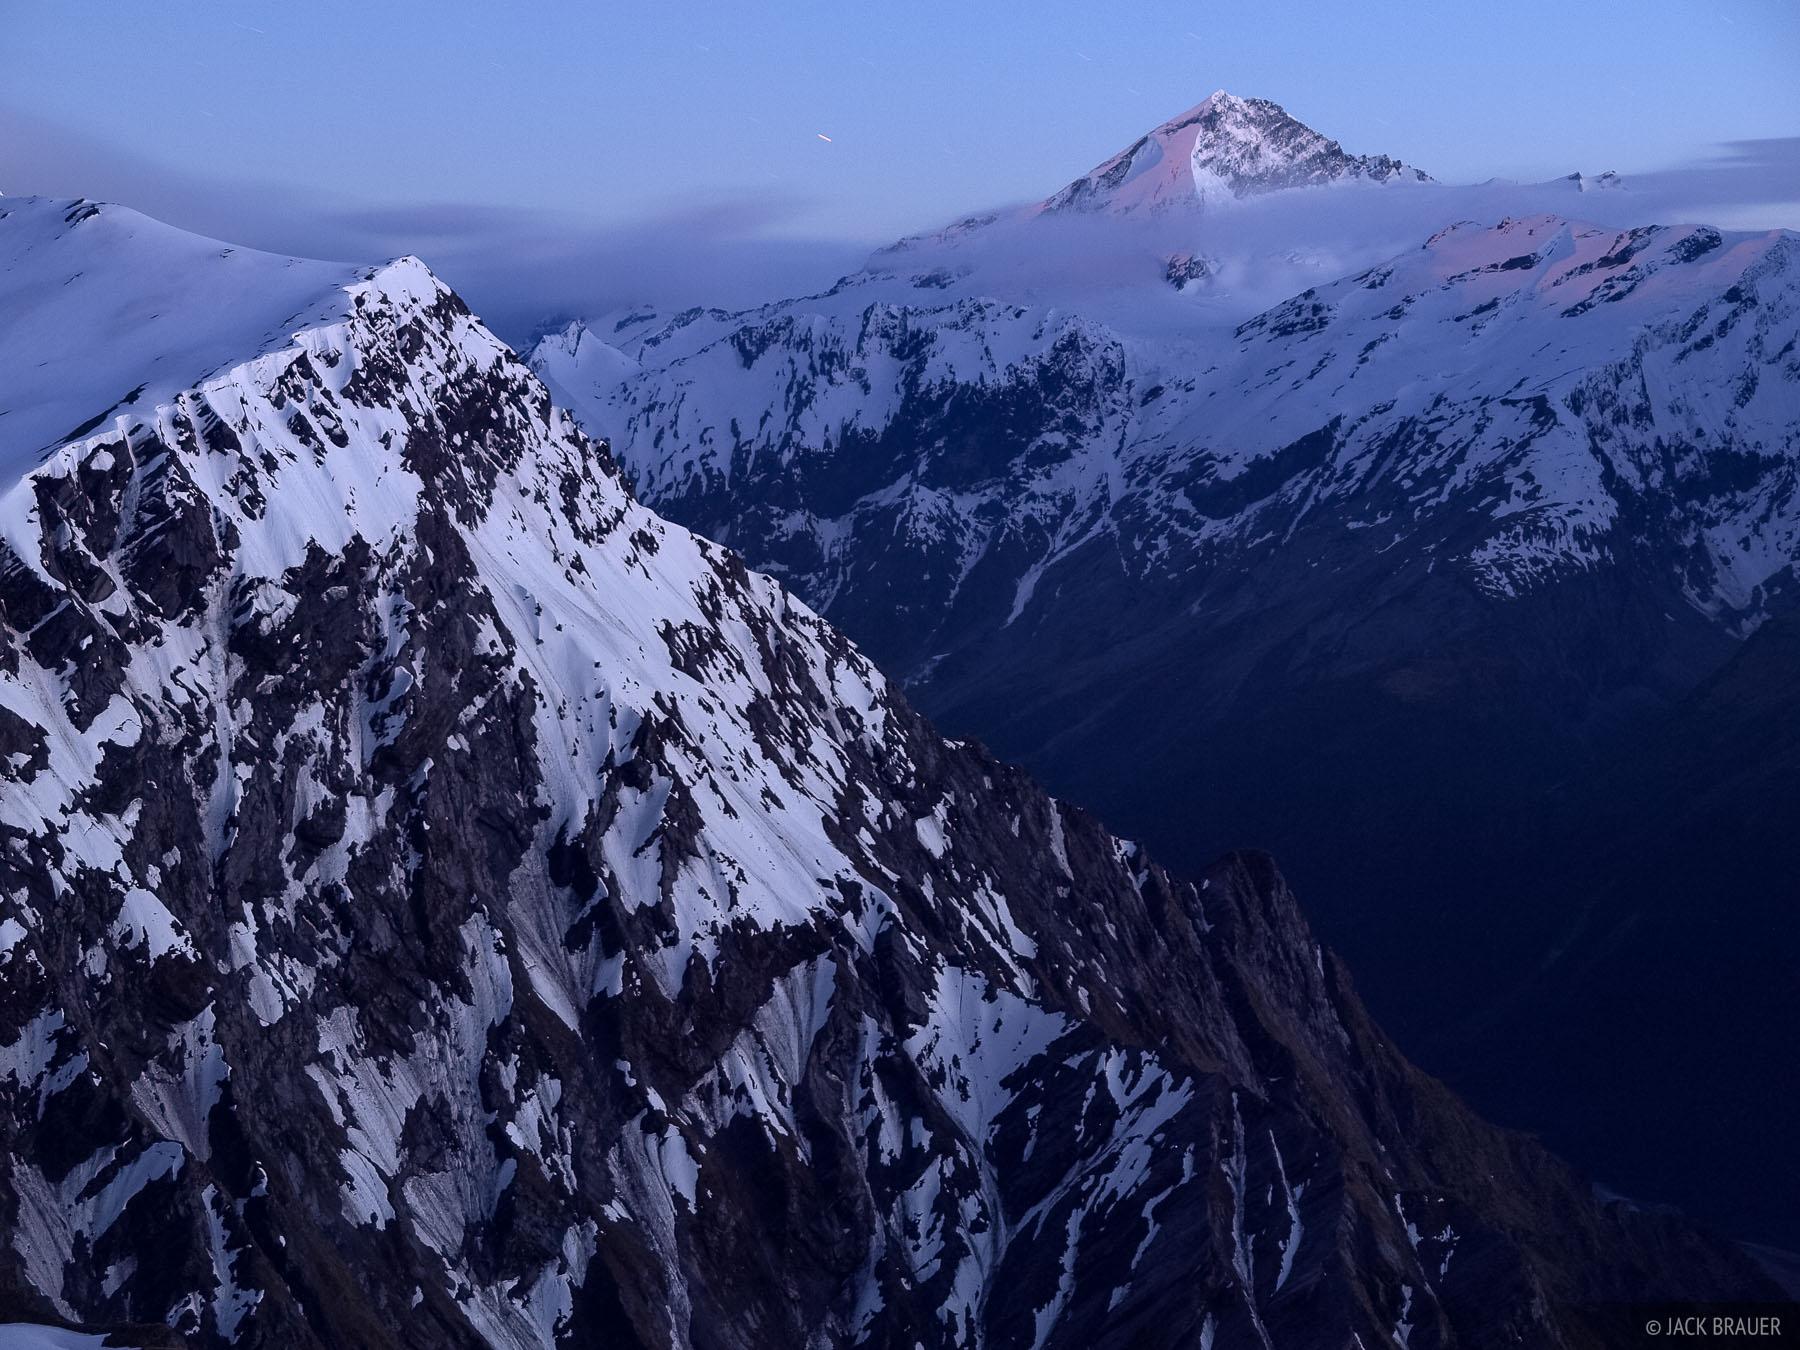 Mount Aspiring, moonset, dawn, New Zealand, photo